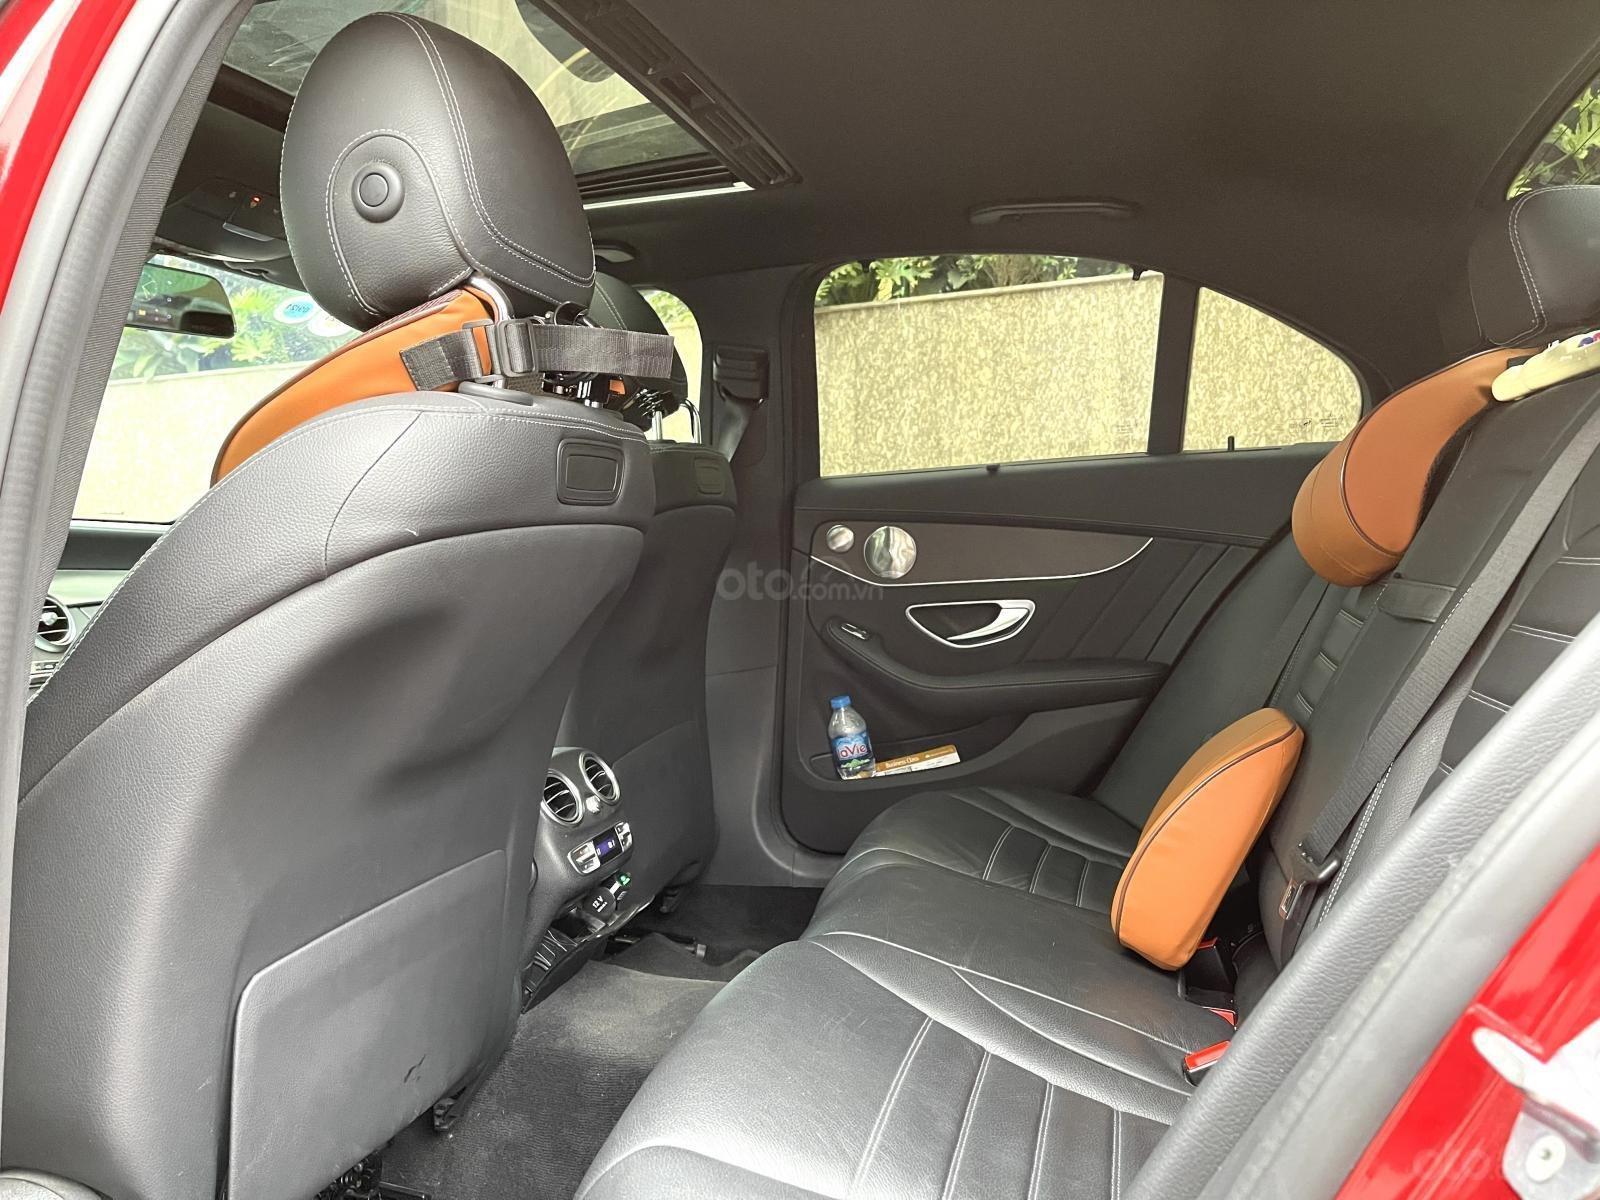 Mercedes Benz C300 AMG model 2019 sản xuất 2018 (7)